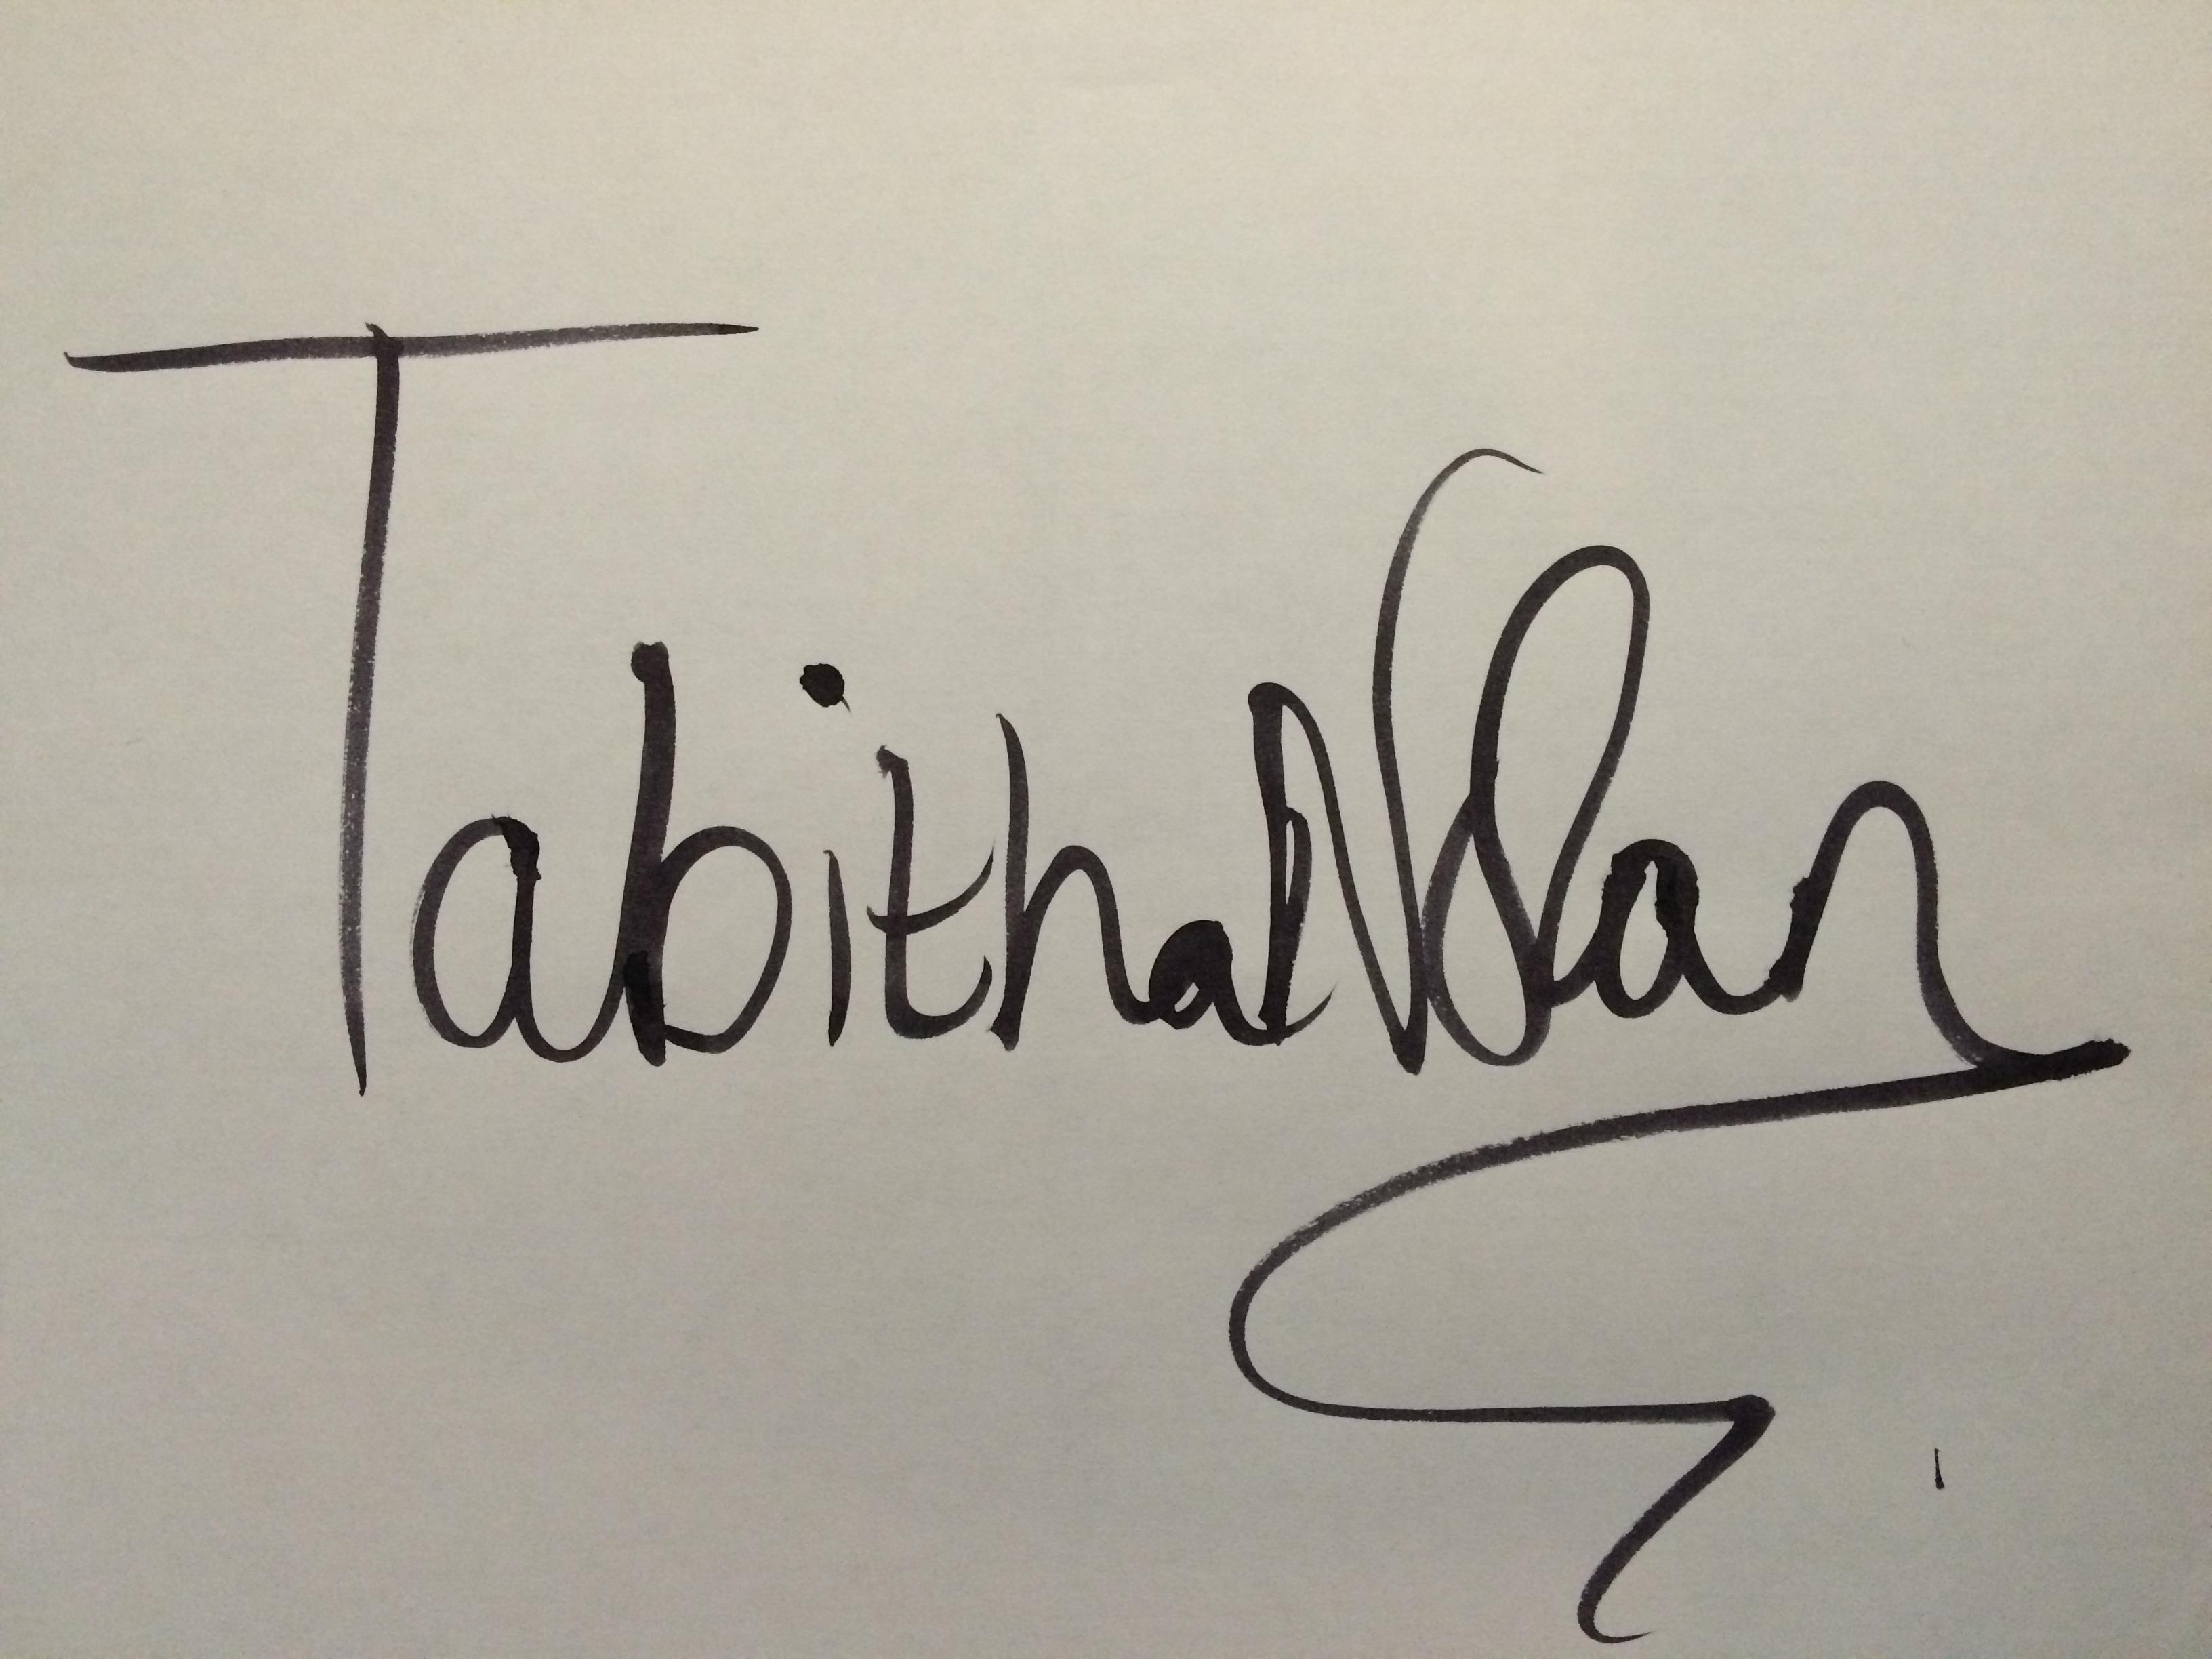 tabitha nolan's Signature